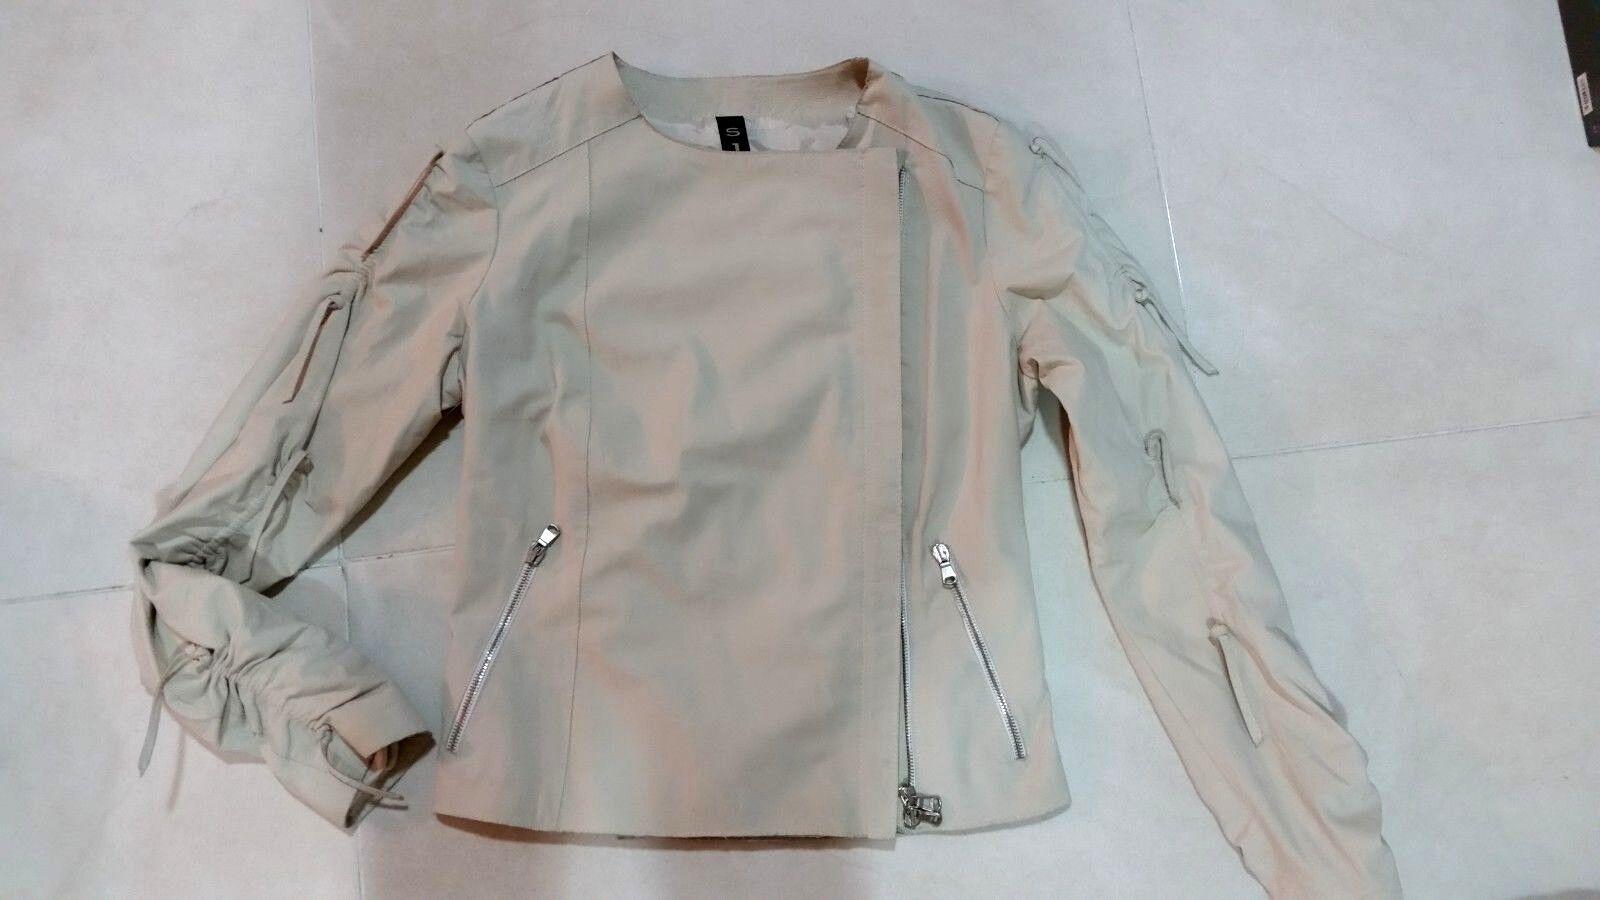 Pre-Owned S PH Pour Femme Doux Cuir Véritable Veste Taille S made in  Blanc